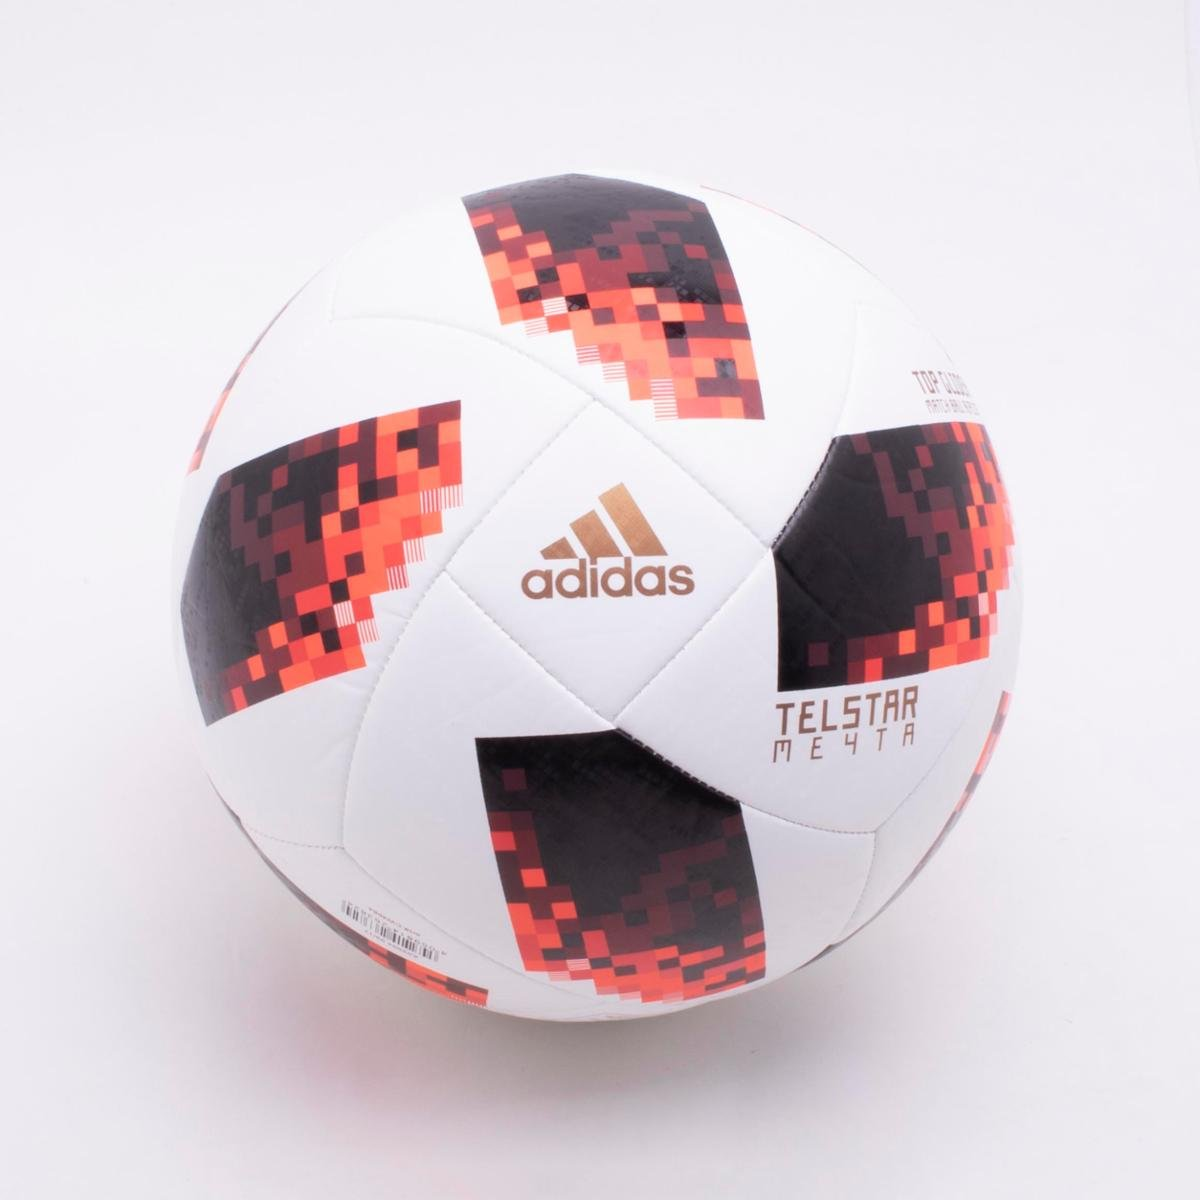 Bola de Futebol Campo Adidas Telstar 18 Top Glider Réplica Mata-Mata Copa do  Mundo ... 721100f79e1c3